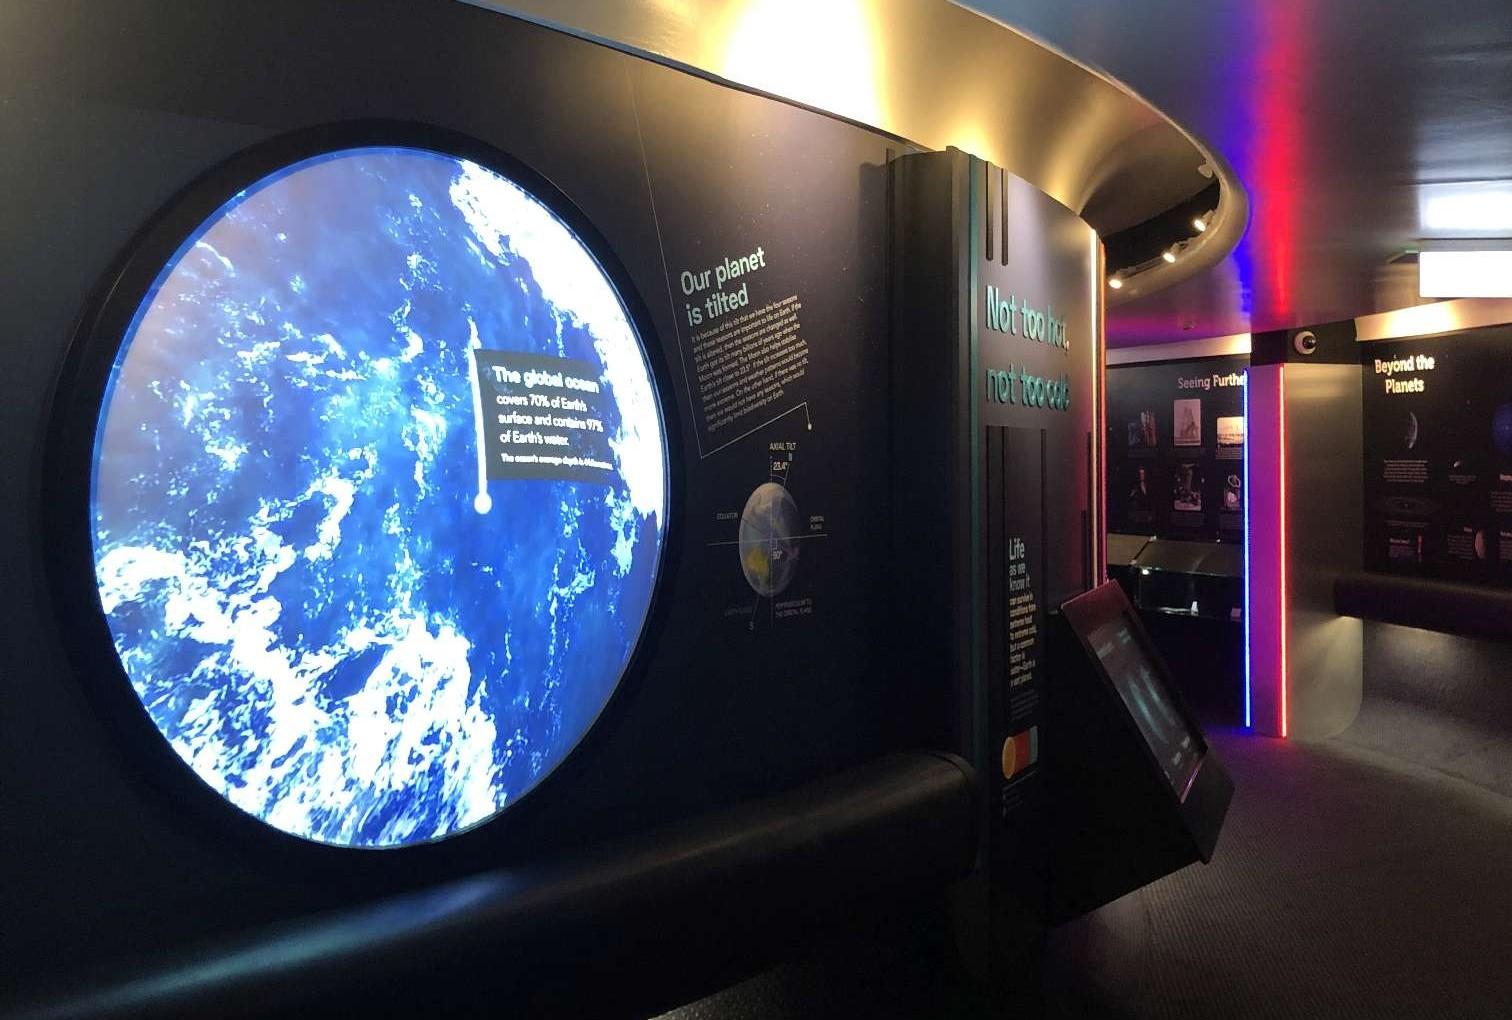 planetarium projection mapping globe exhibit